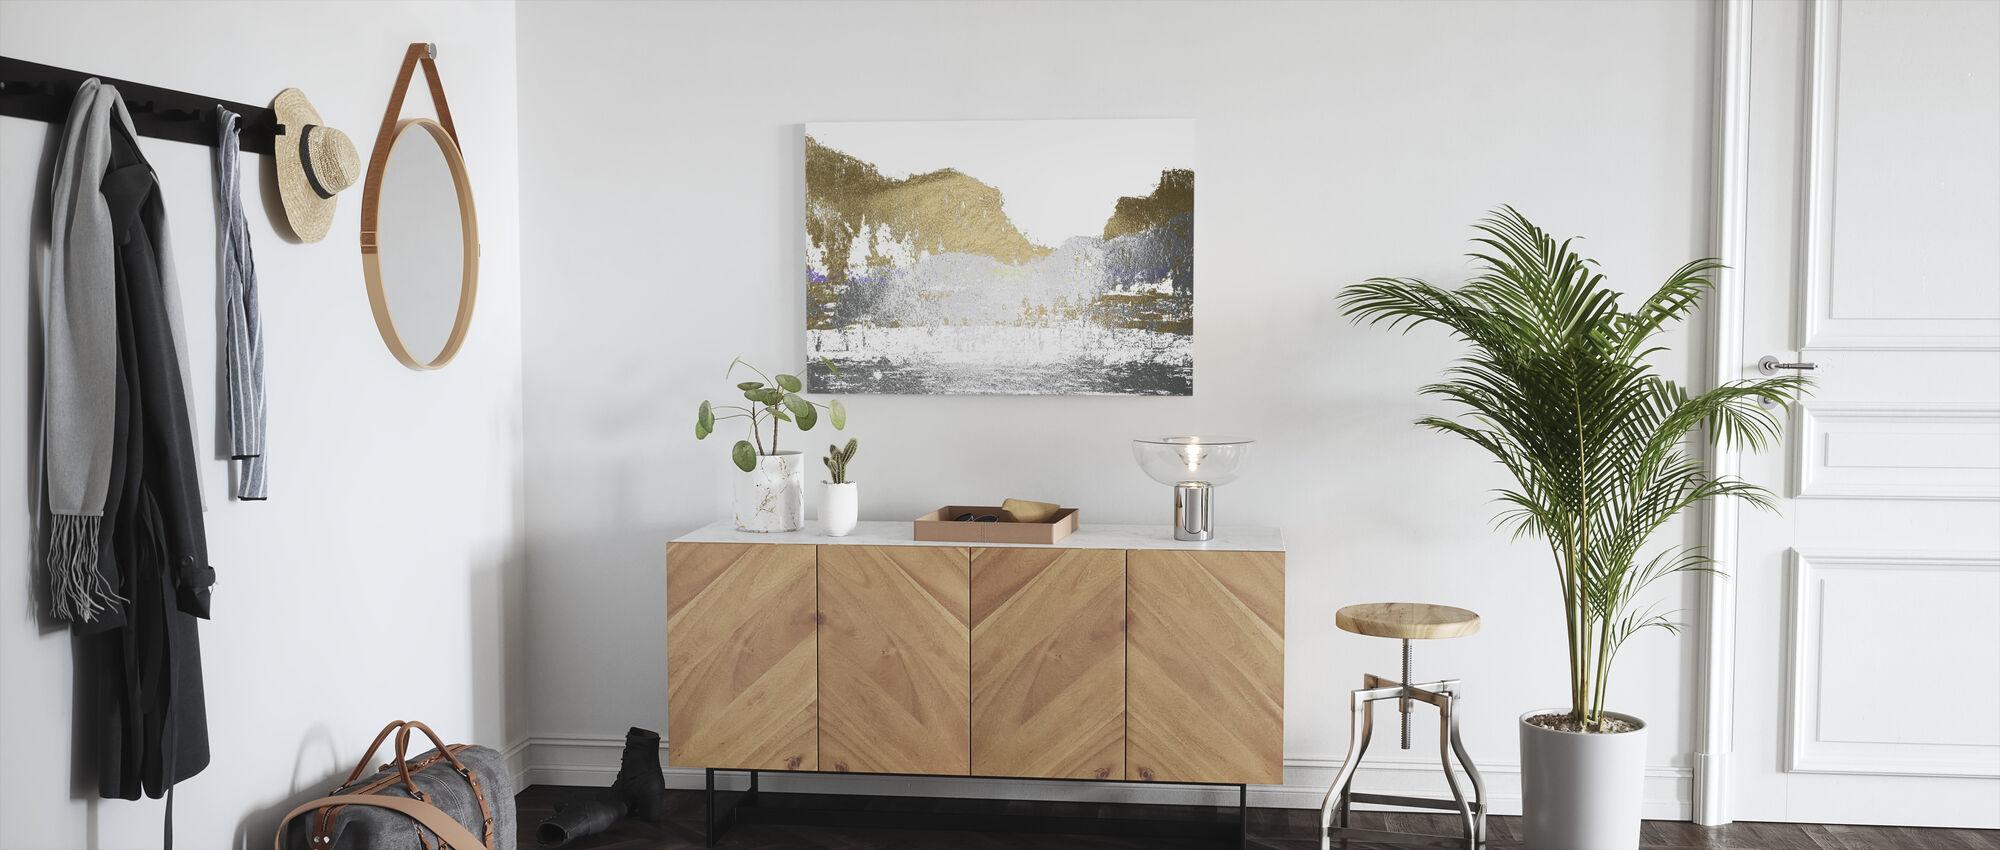 Monifoliovuori - Canvastaulu - Aula